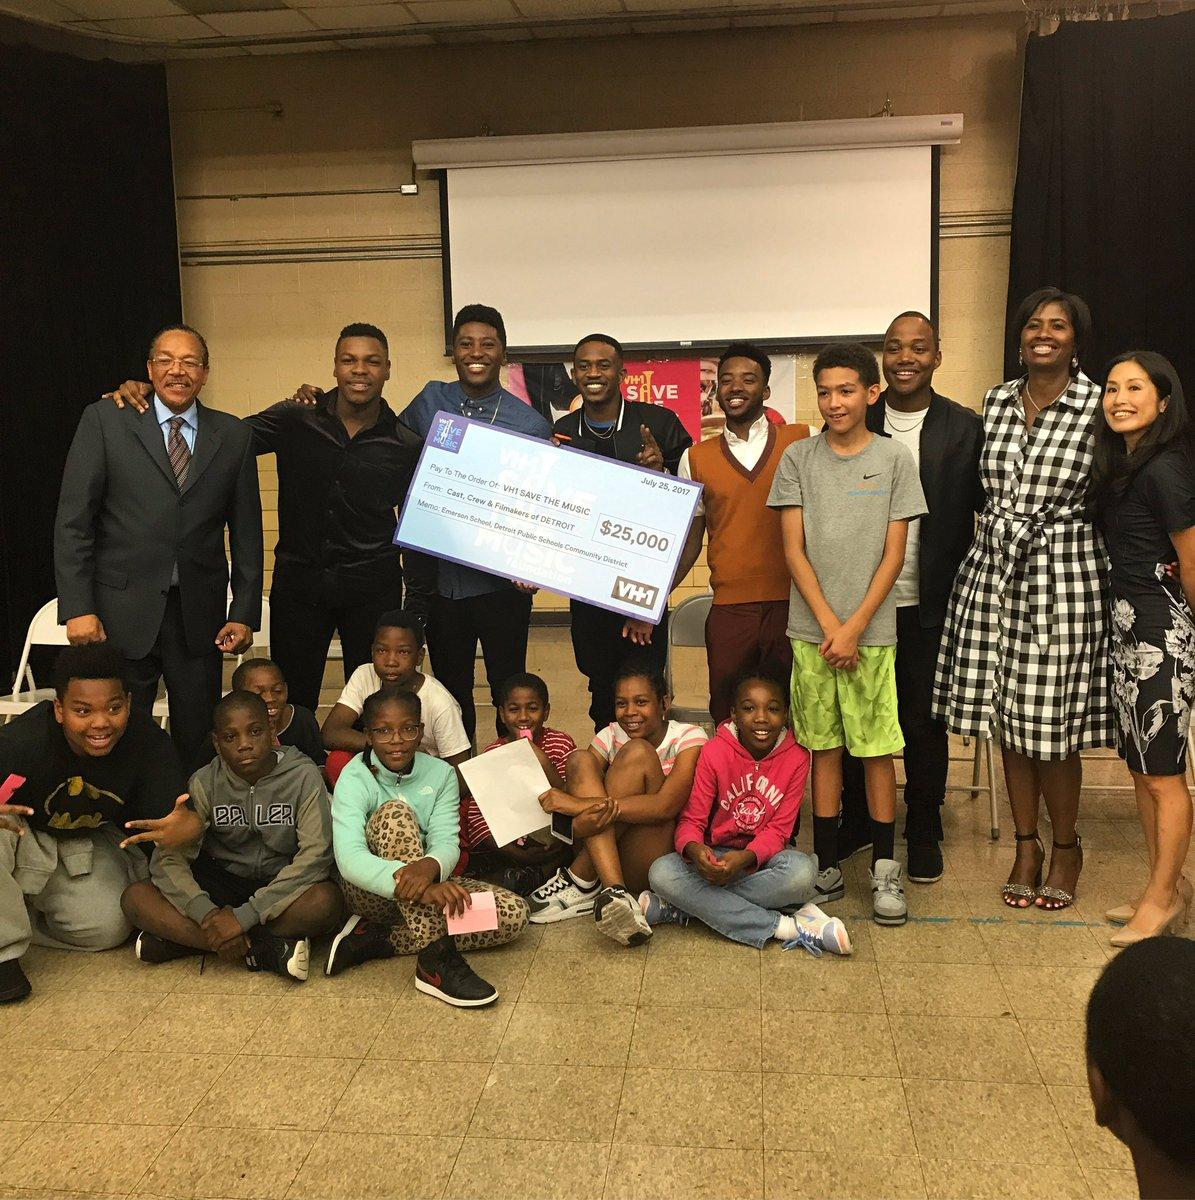 Thank you Emerson Elementary and @VH1SaveTheMusic! #DETROITmovie https...